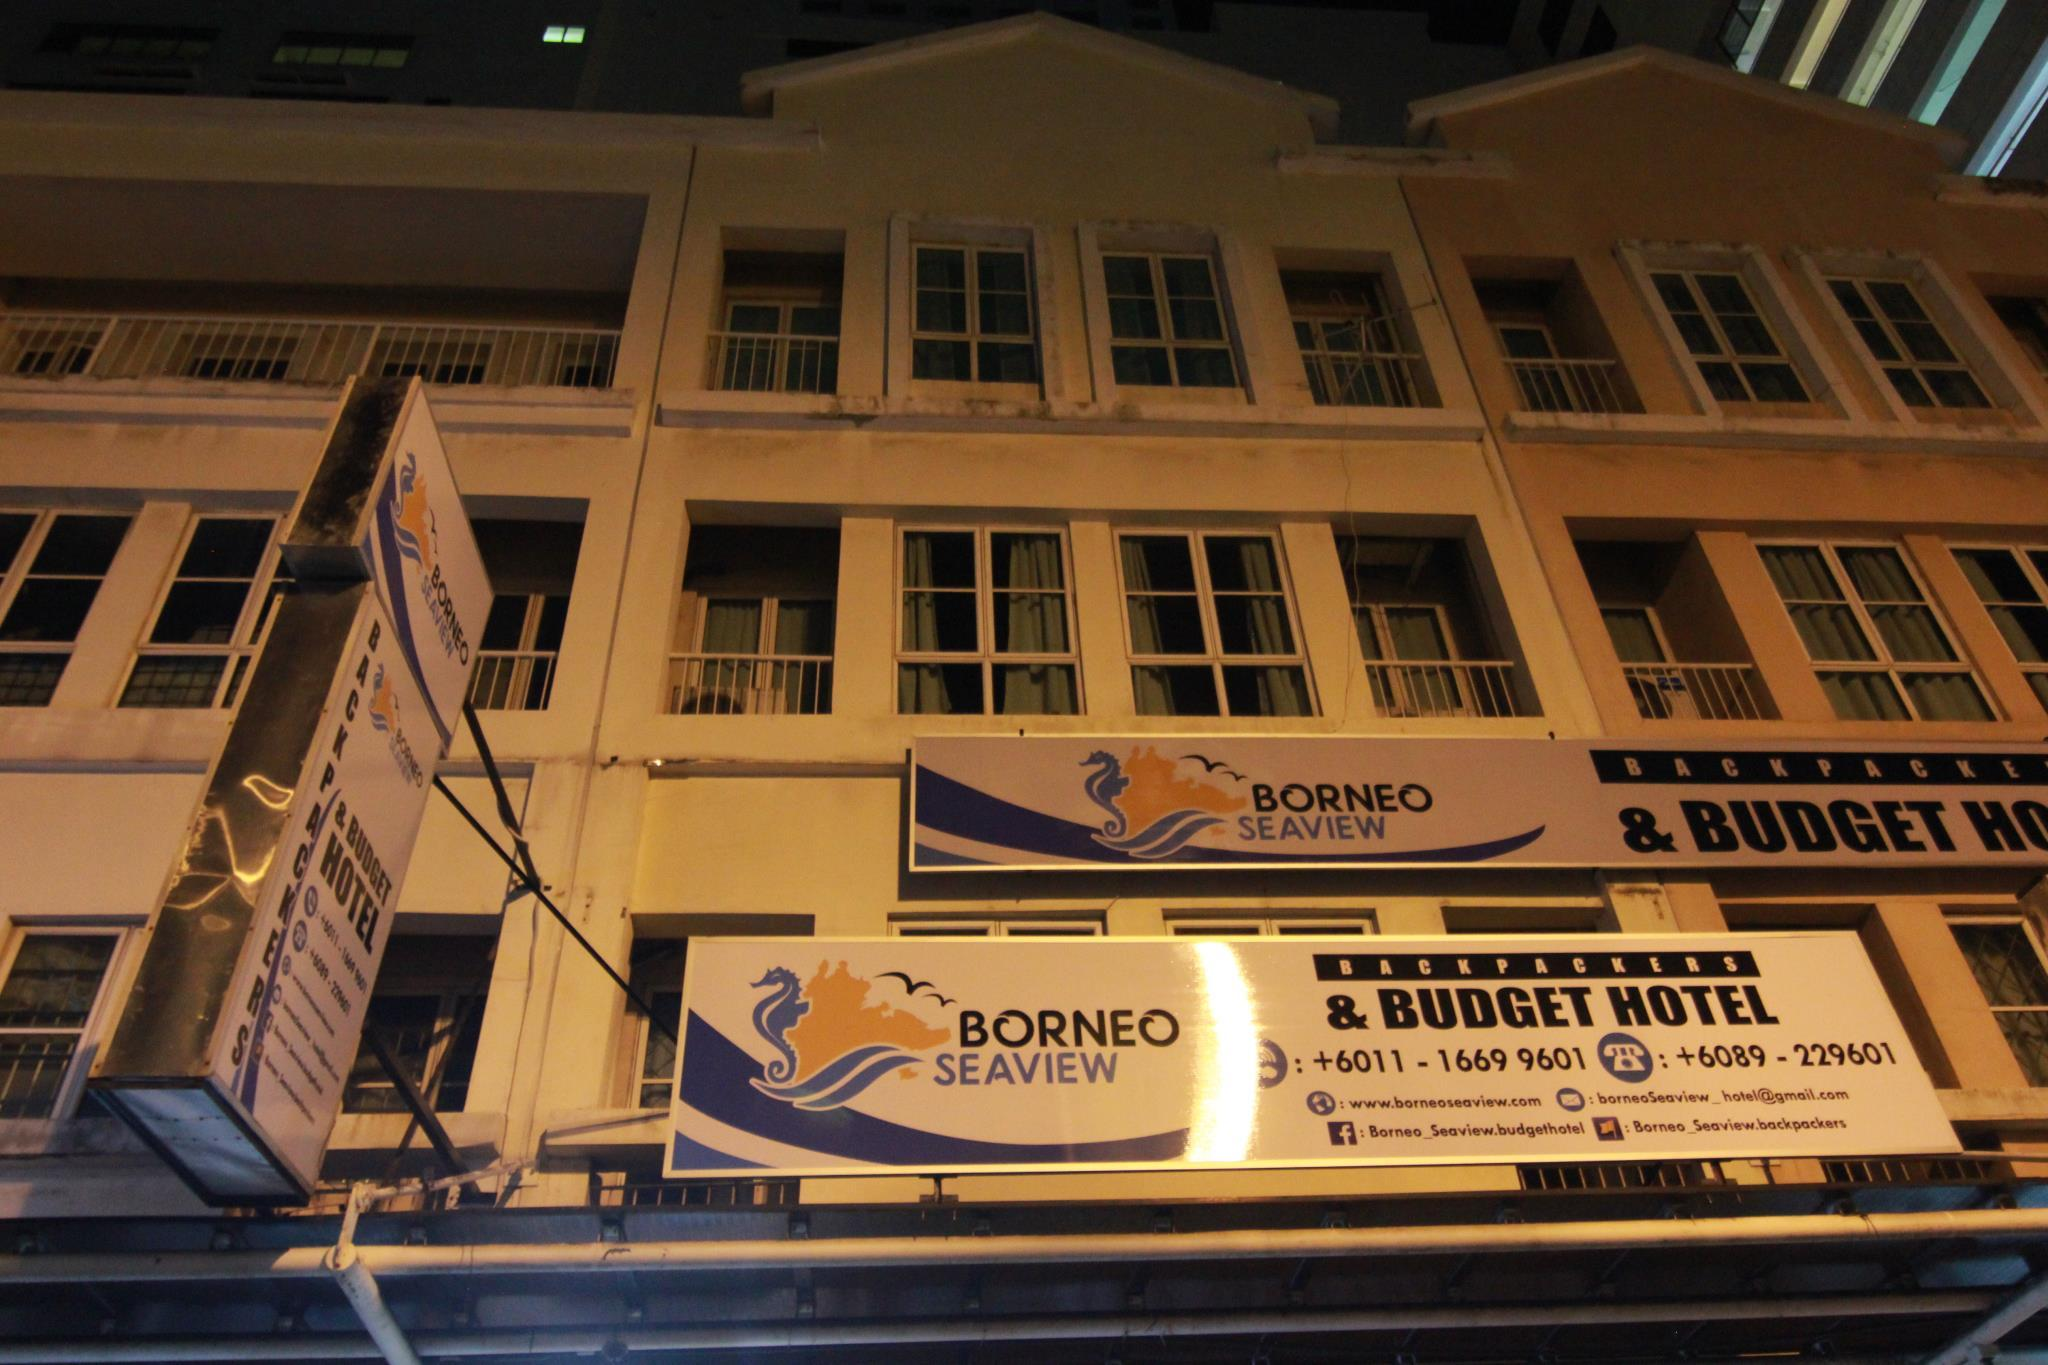 Borneo Seaview Budget & Backpackers Hotel, Sandakan